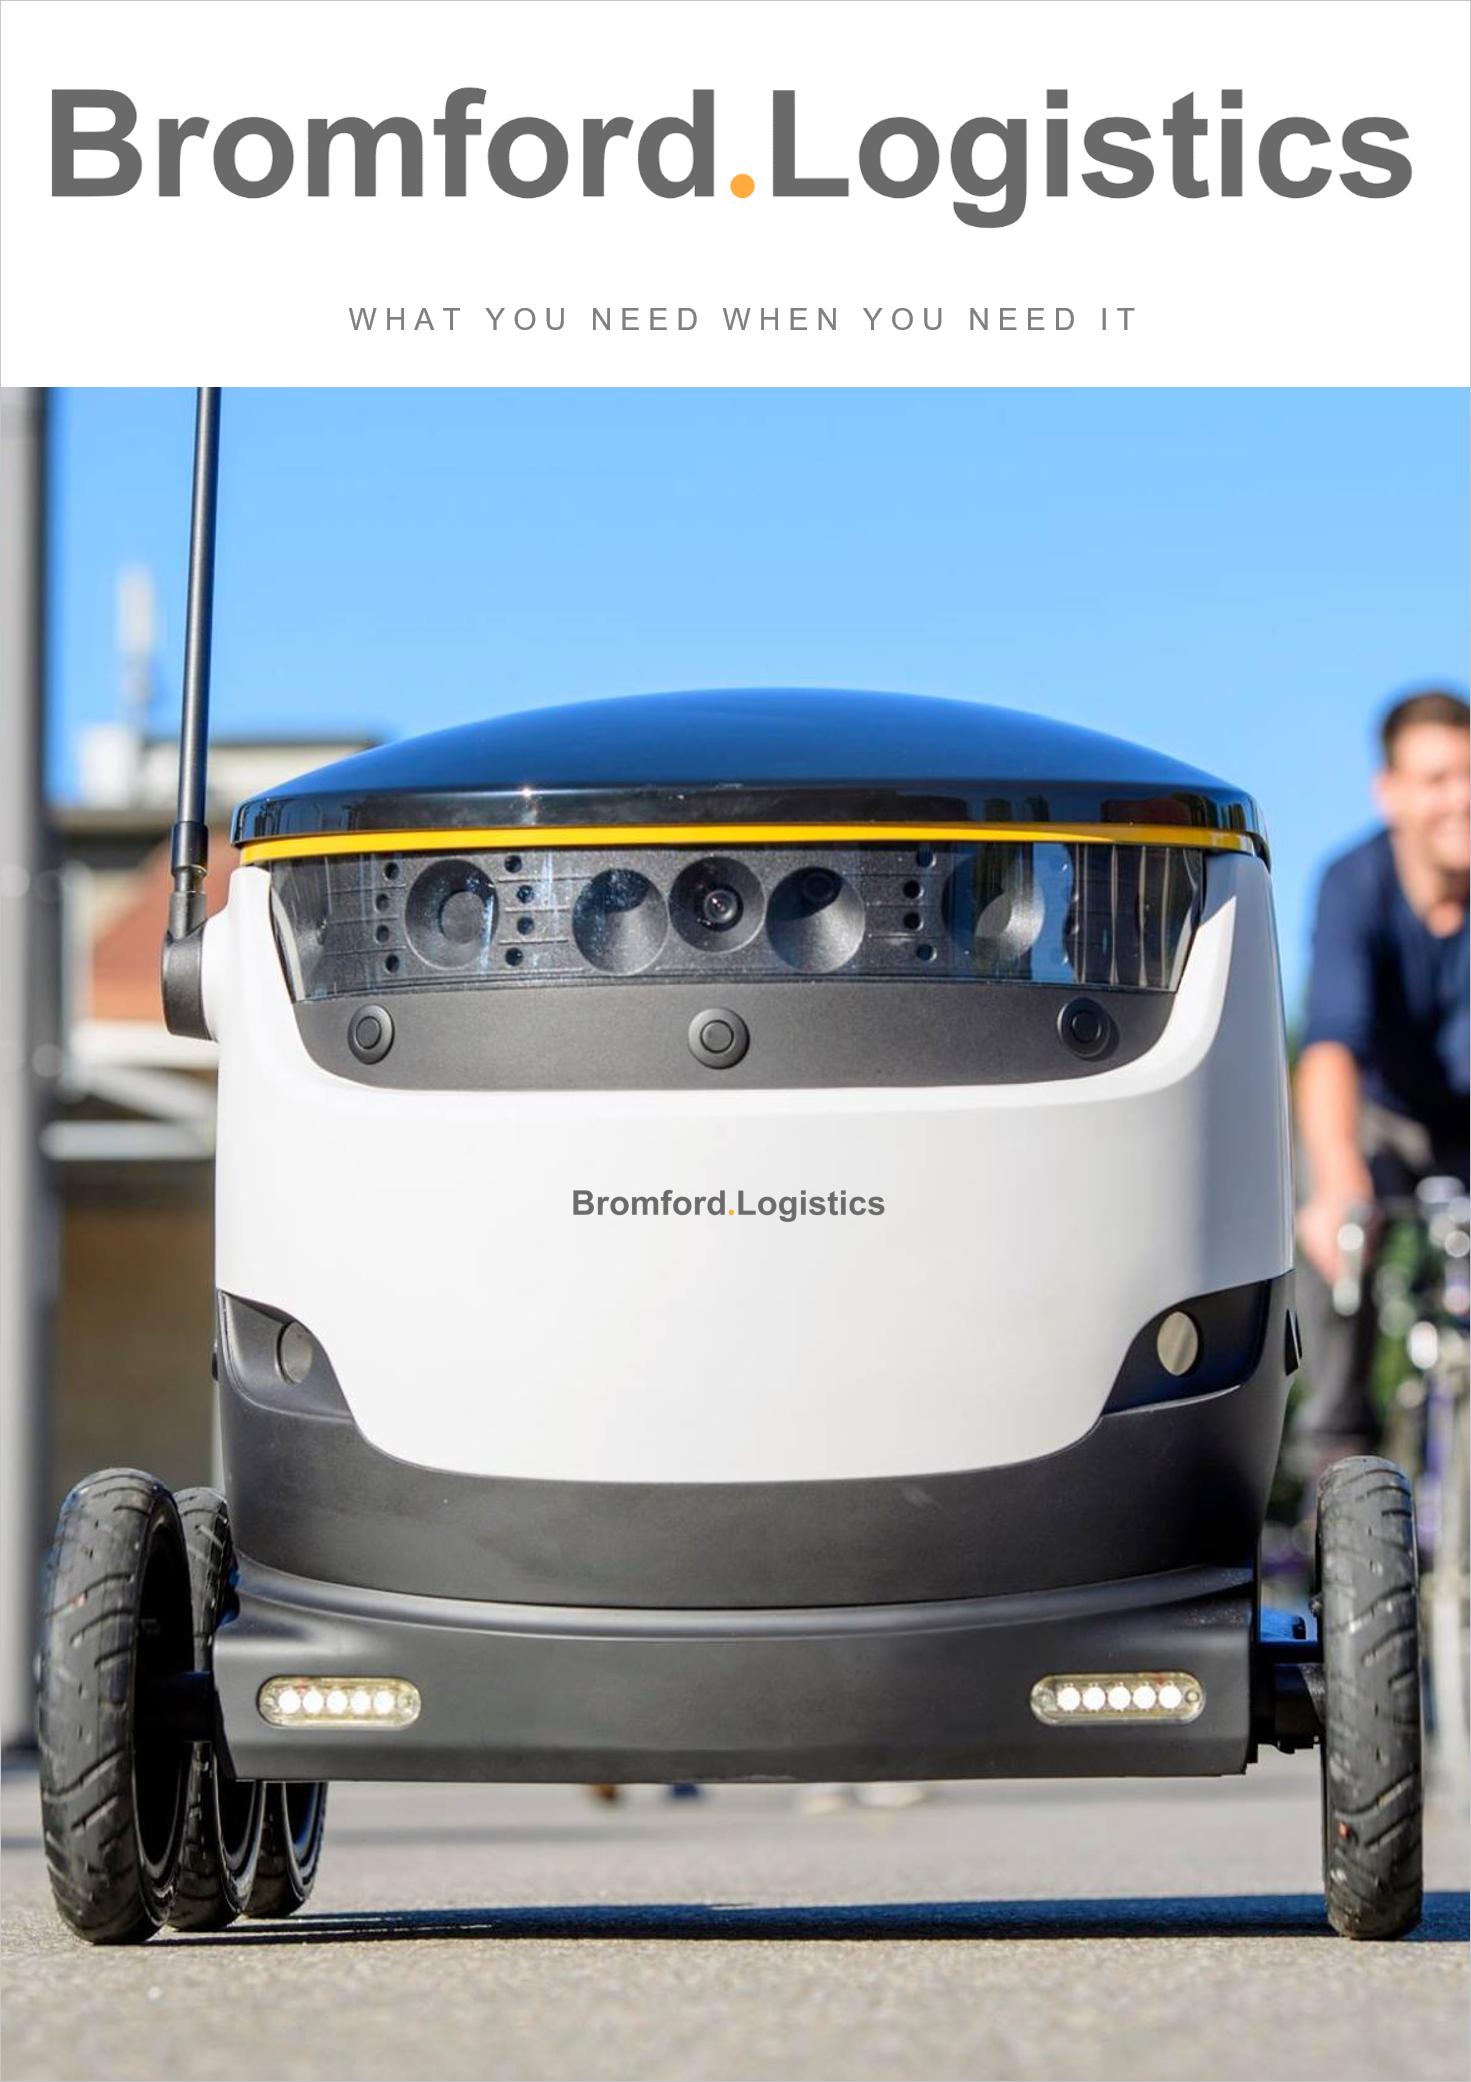 BromfordLogisticsRobot_Poster.png